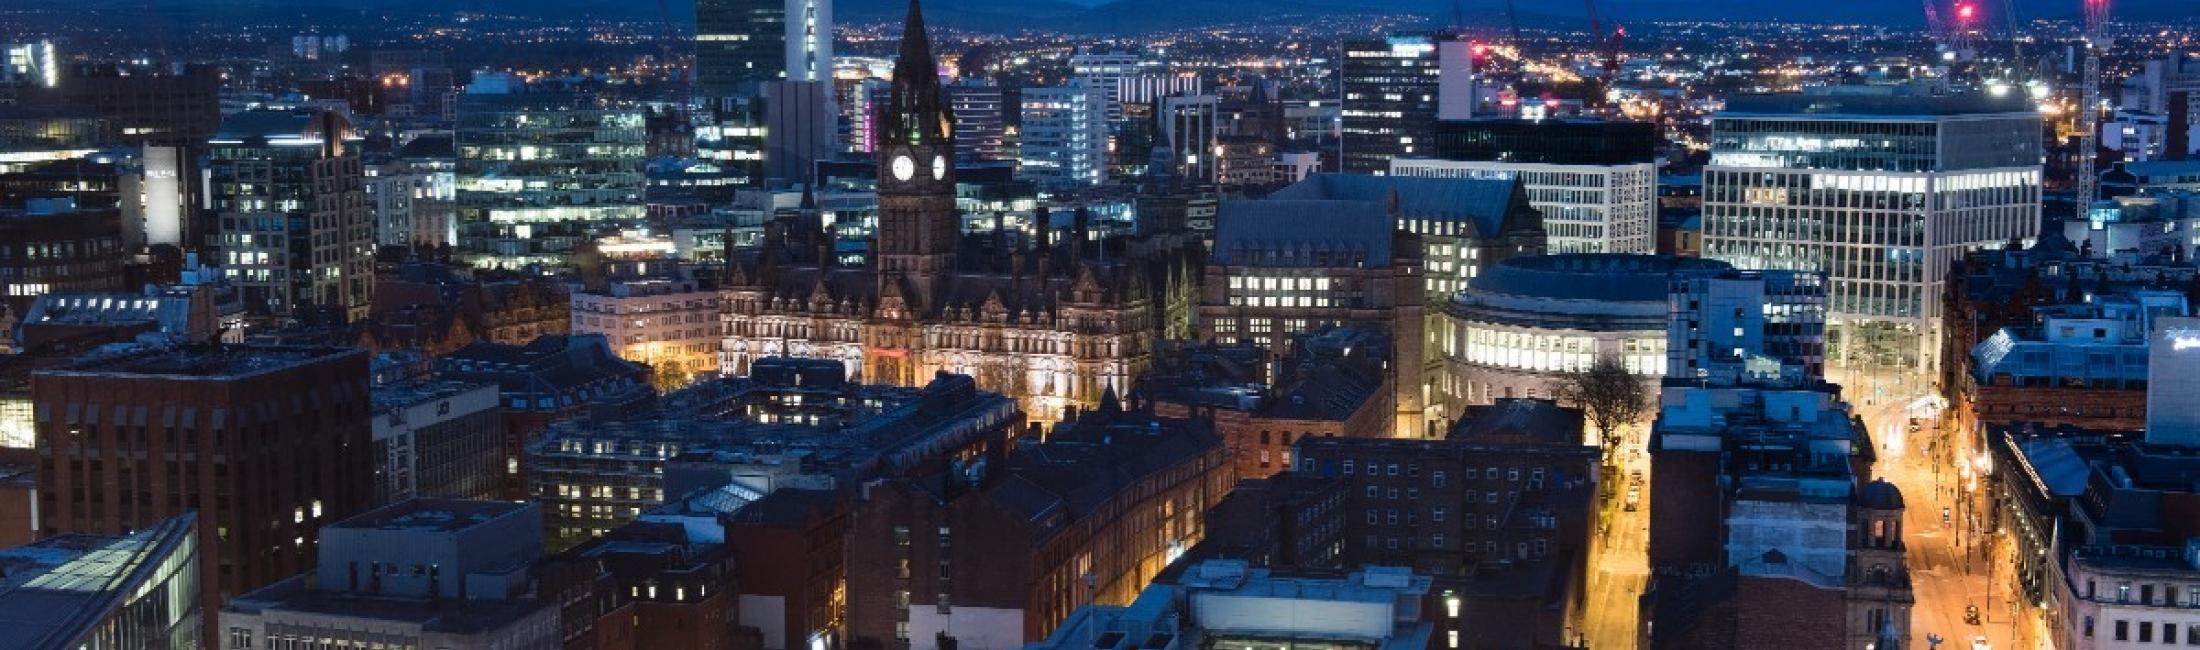 Manchester Skyline 011 2018